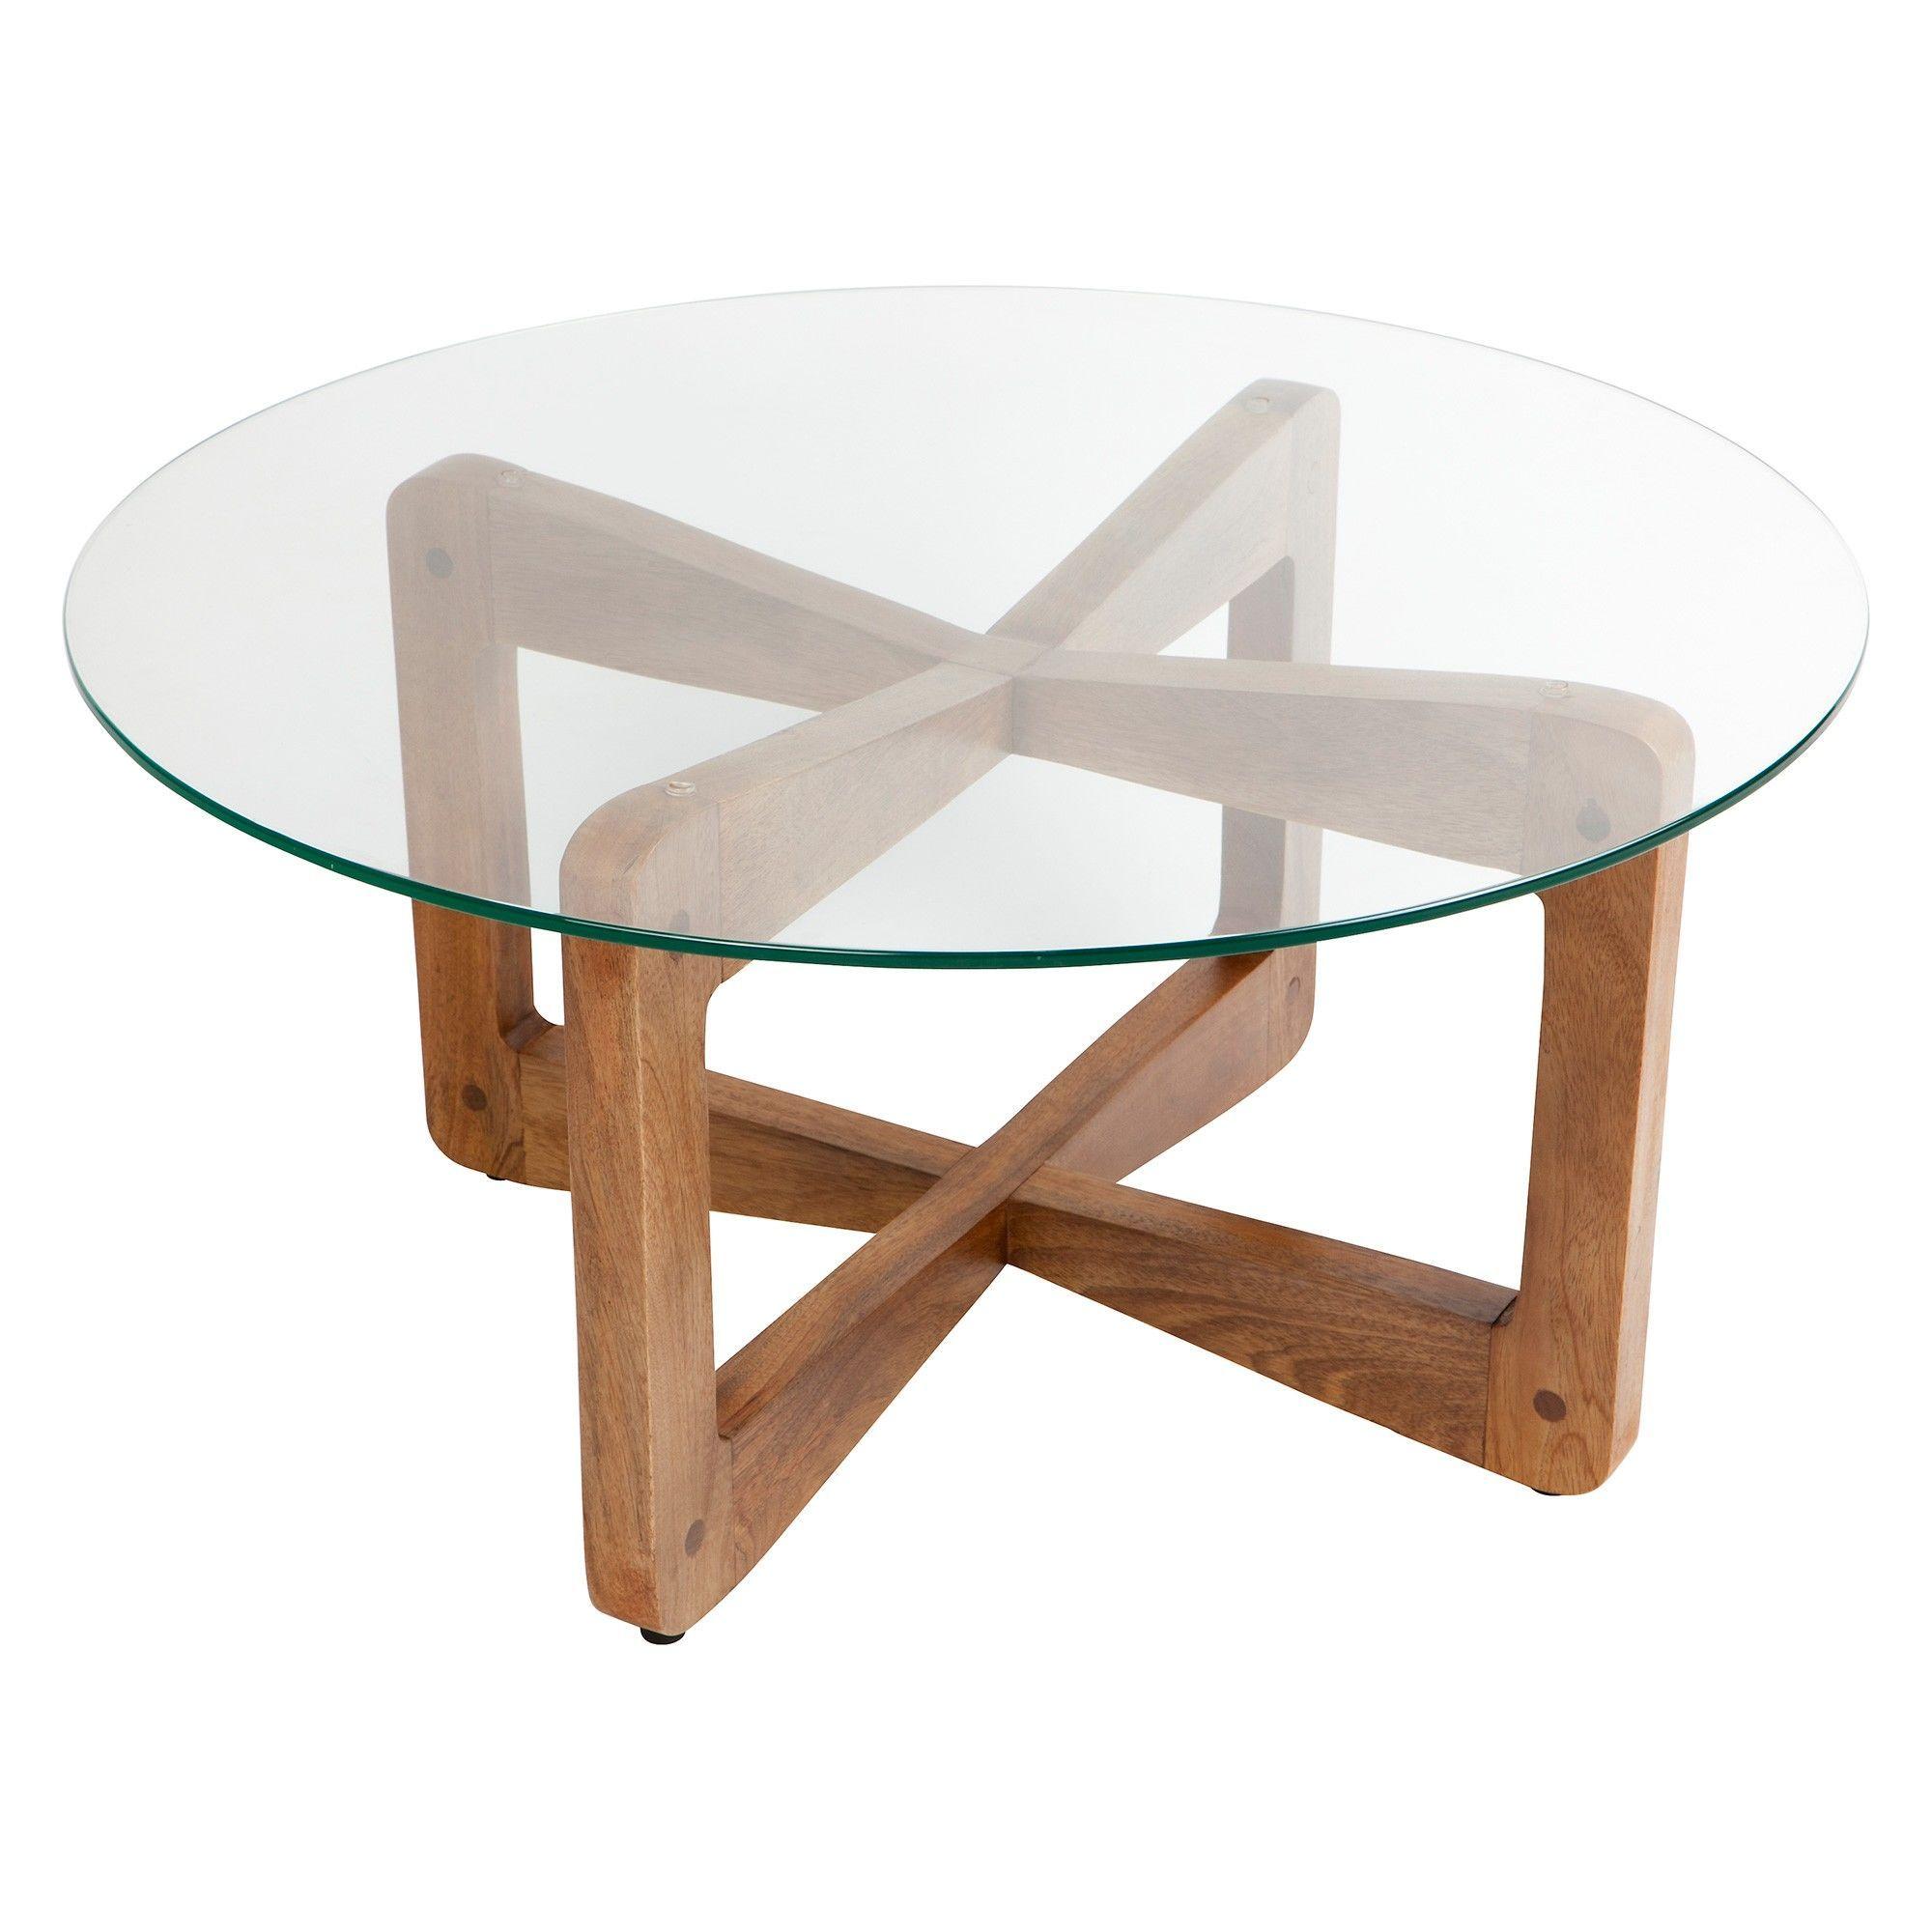 Lisbon Glass Amp Teak Timber Round Coffee Table 80cm Coffee Table Round Coffee Table Coffee Table Size [ 2000 x 2000 Pixel ]